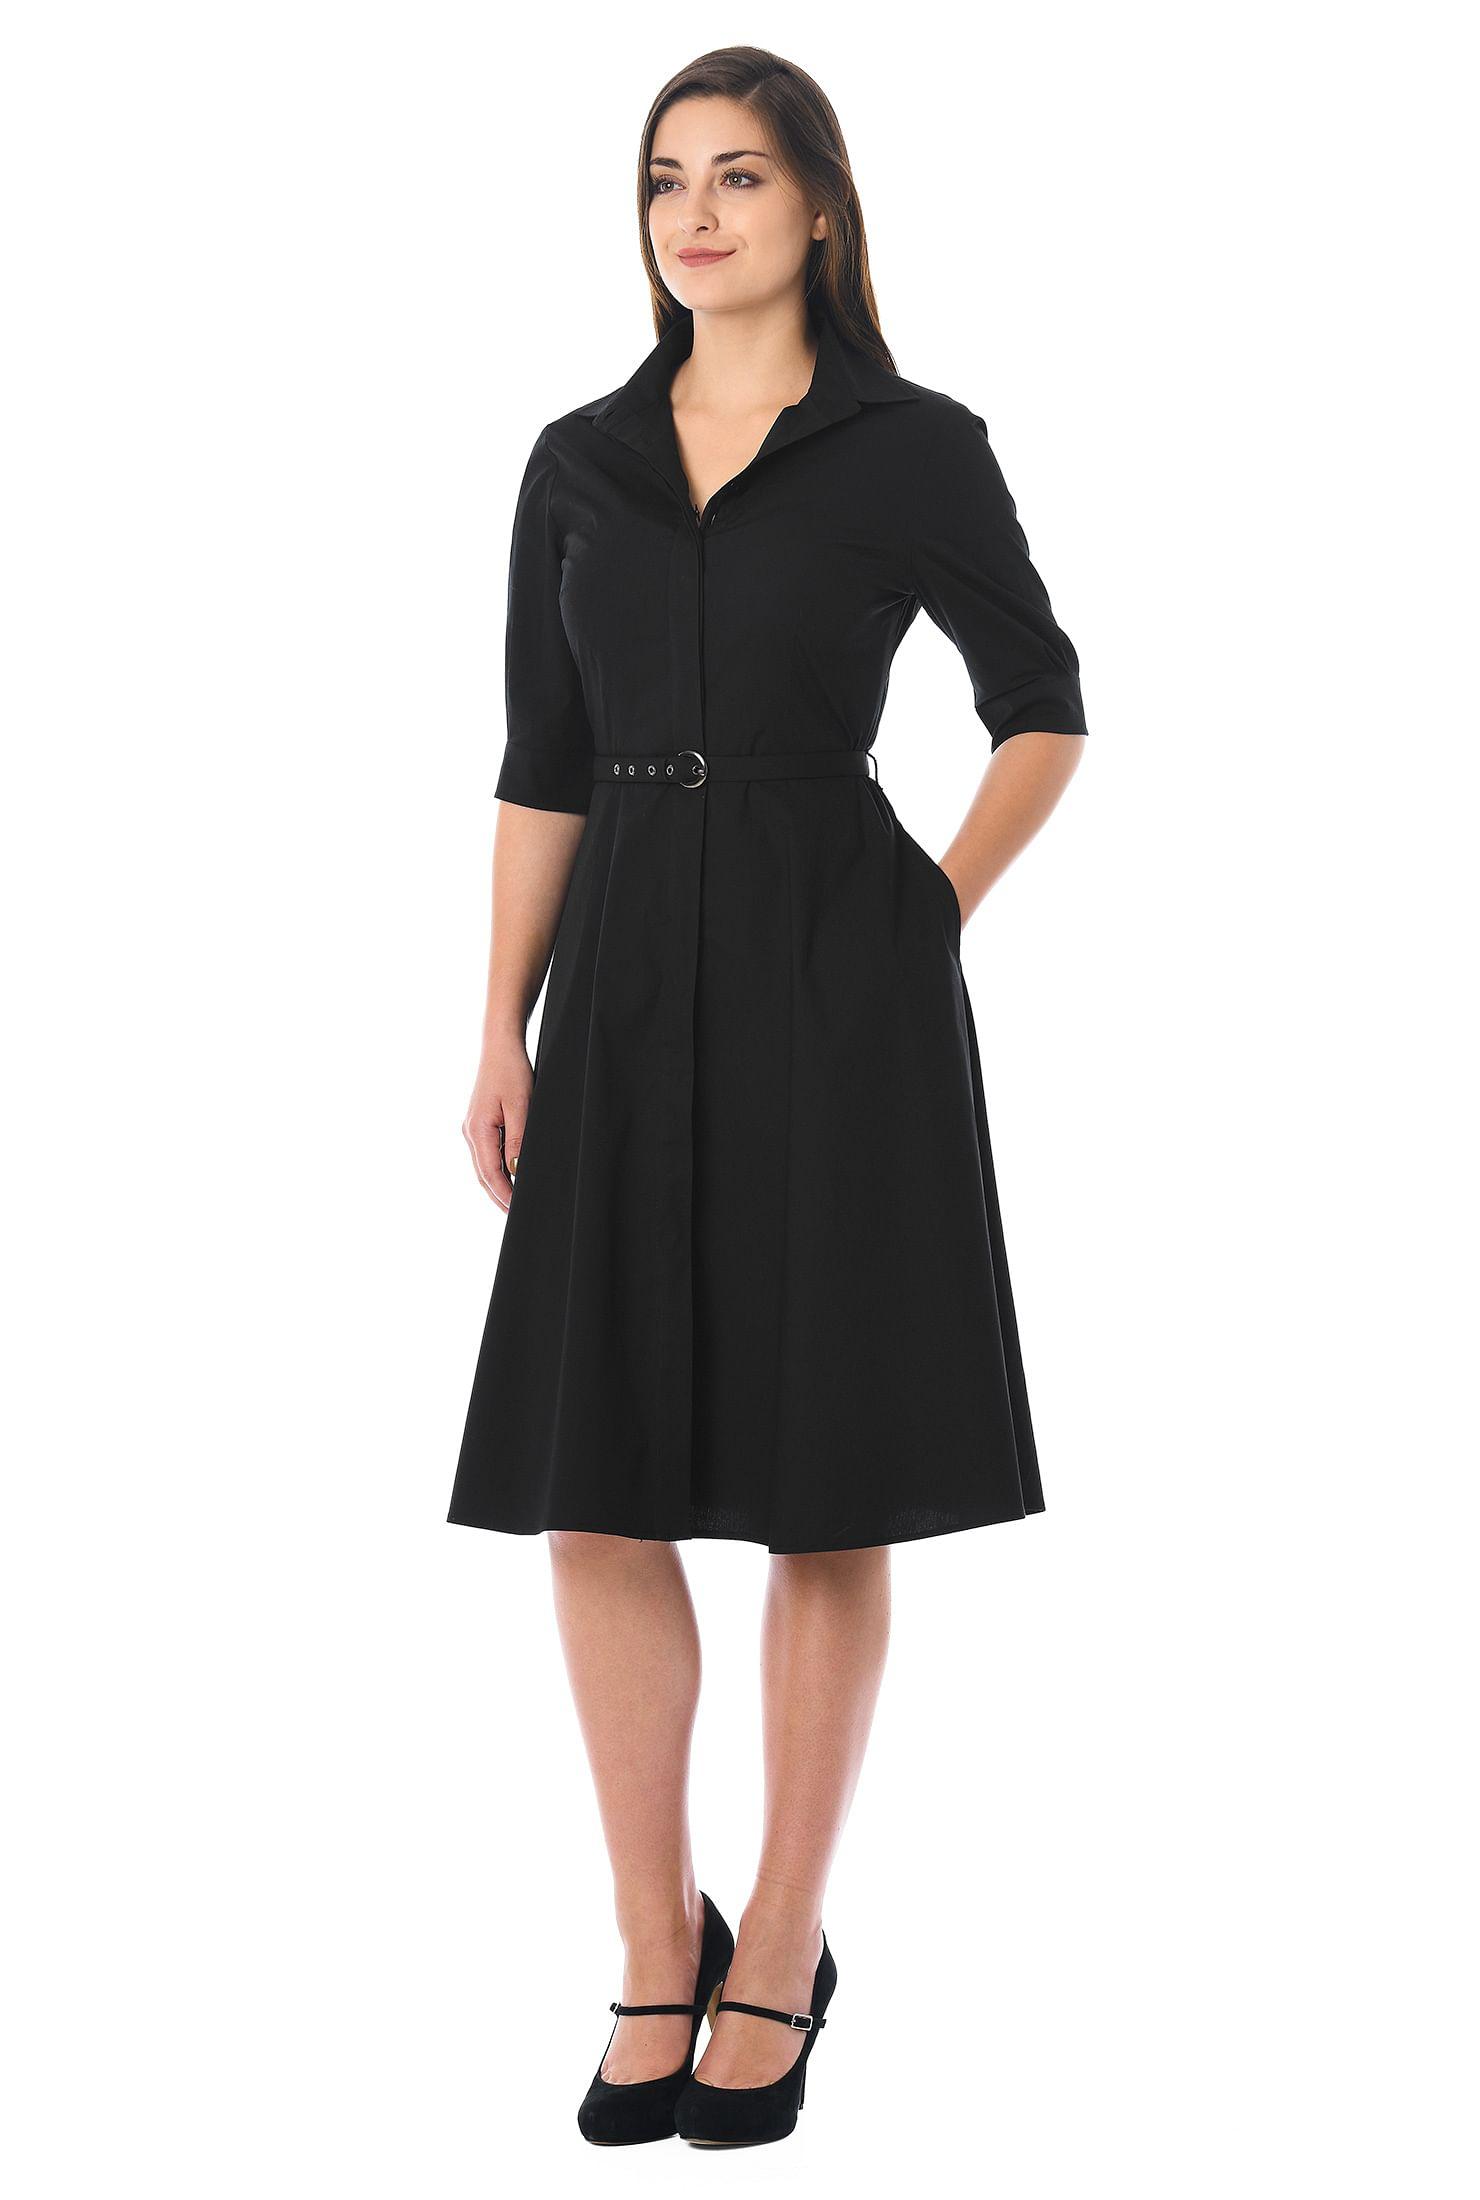 1950s Housewife Dress | 50s Day Dresses Cotton poplin belted shirtdress $54.95 AT vintagedancer.com